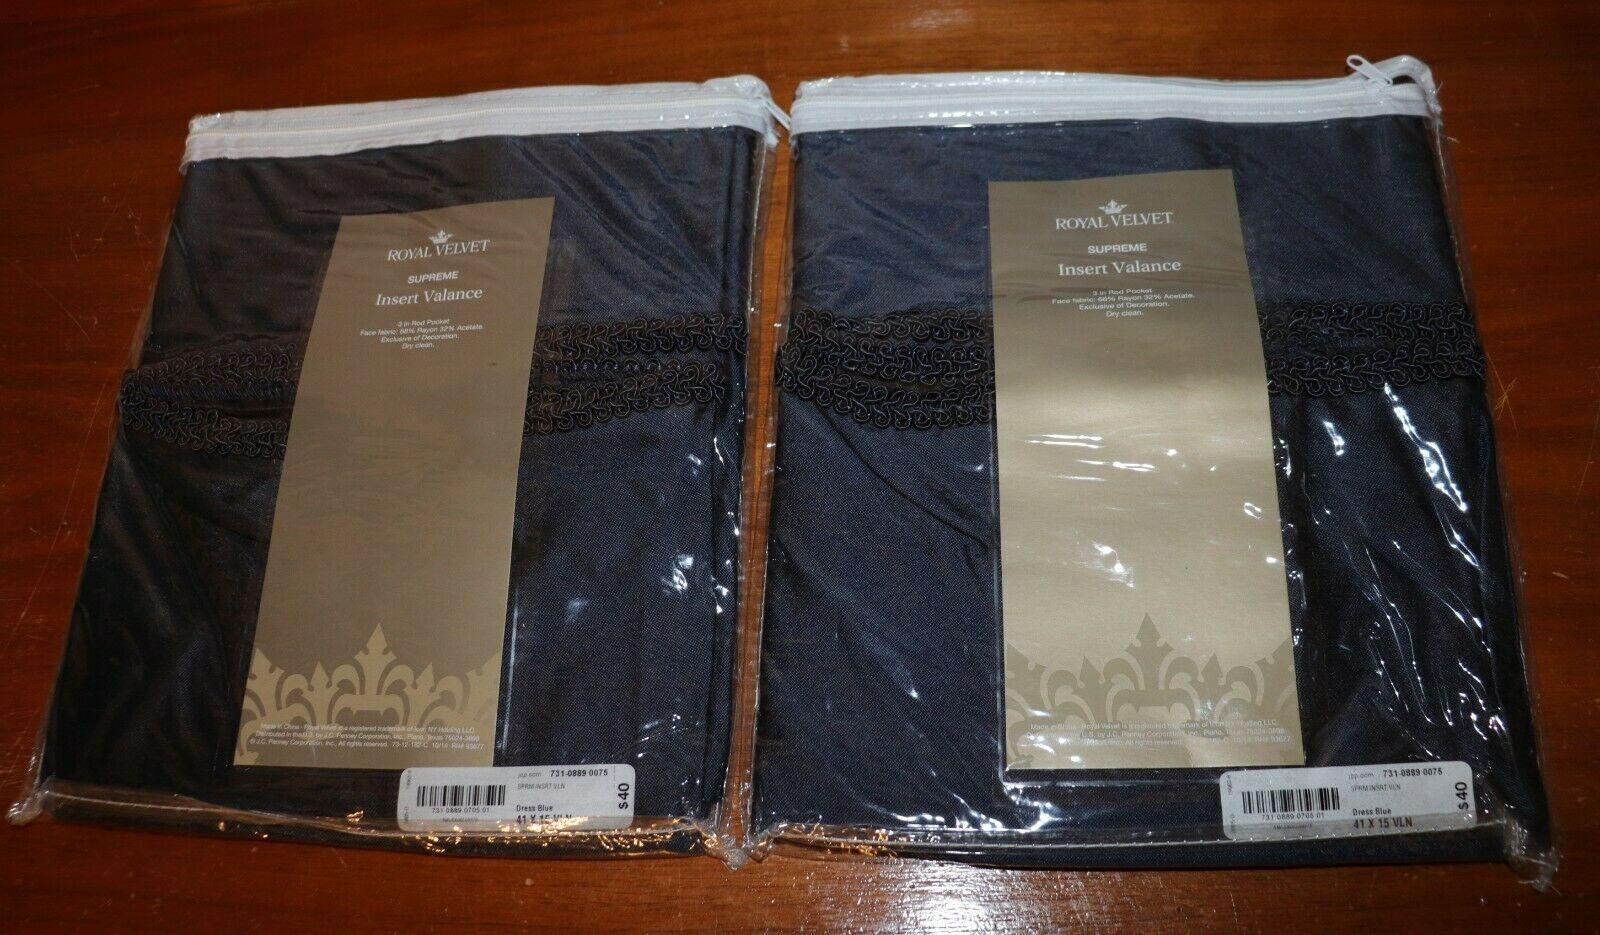 Lot of 2 Dress Blue Royal Velvet Curtain Insert Valances 41 x 15 inch NIP NEW - $10.39